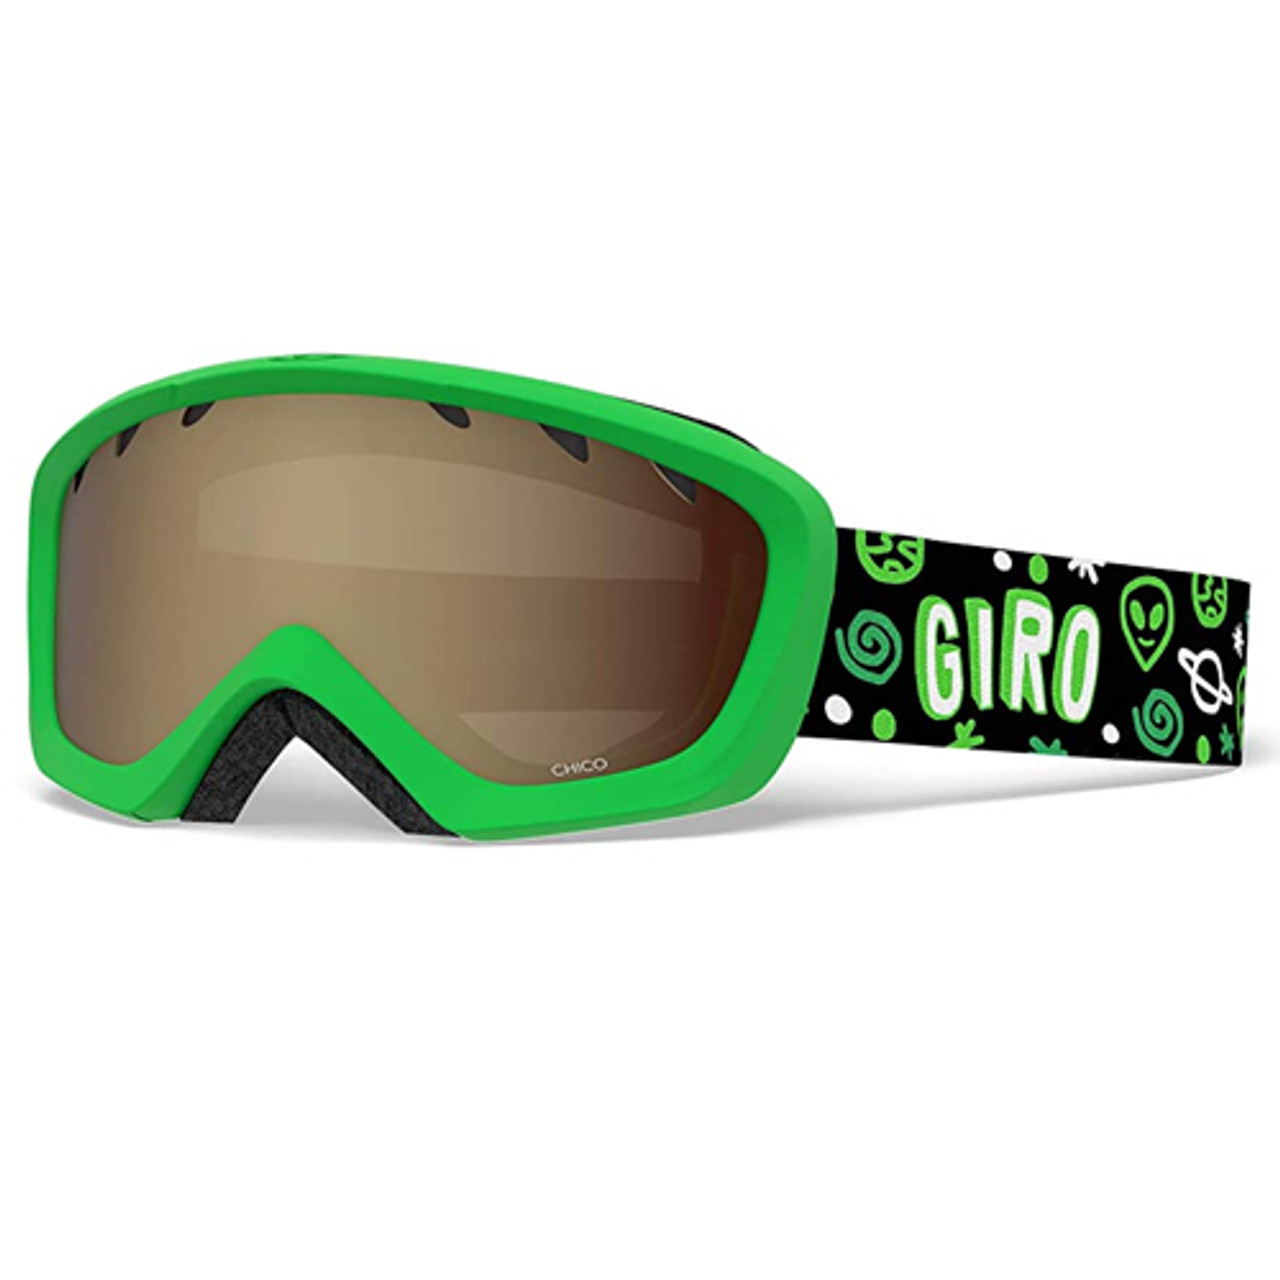 Lens for the Giro Chico Ski Goggles